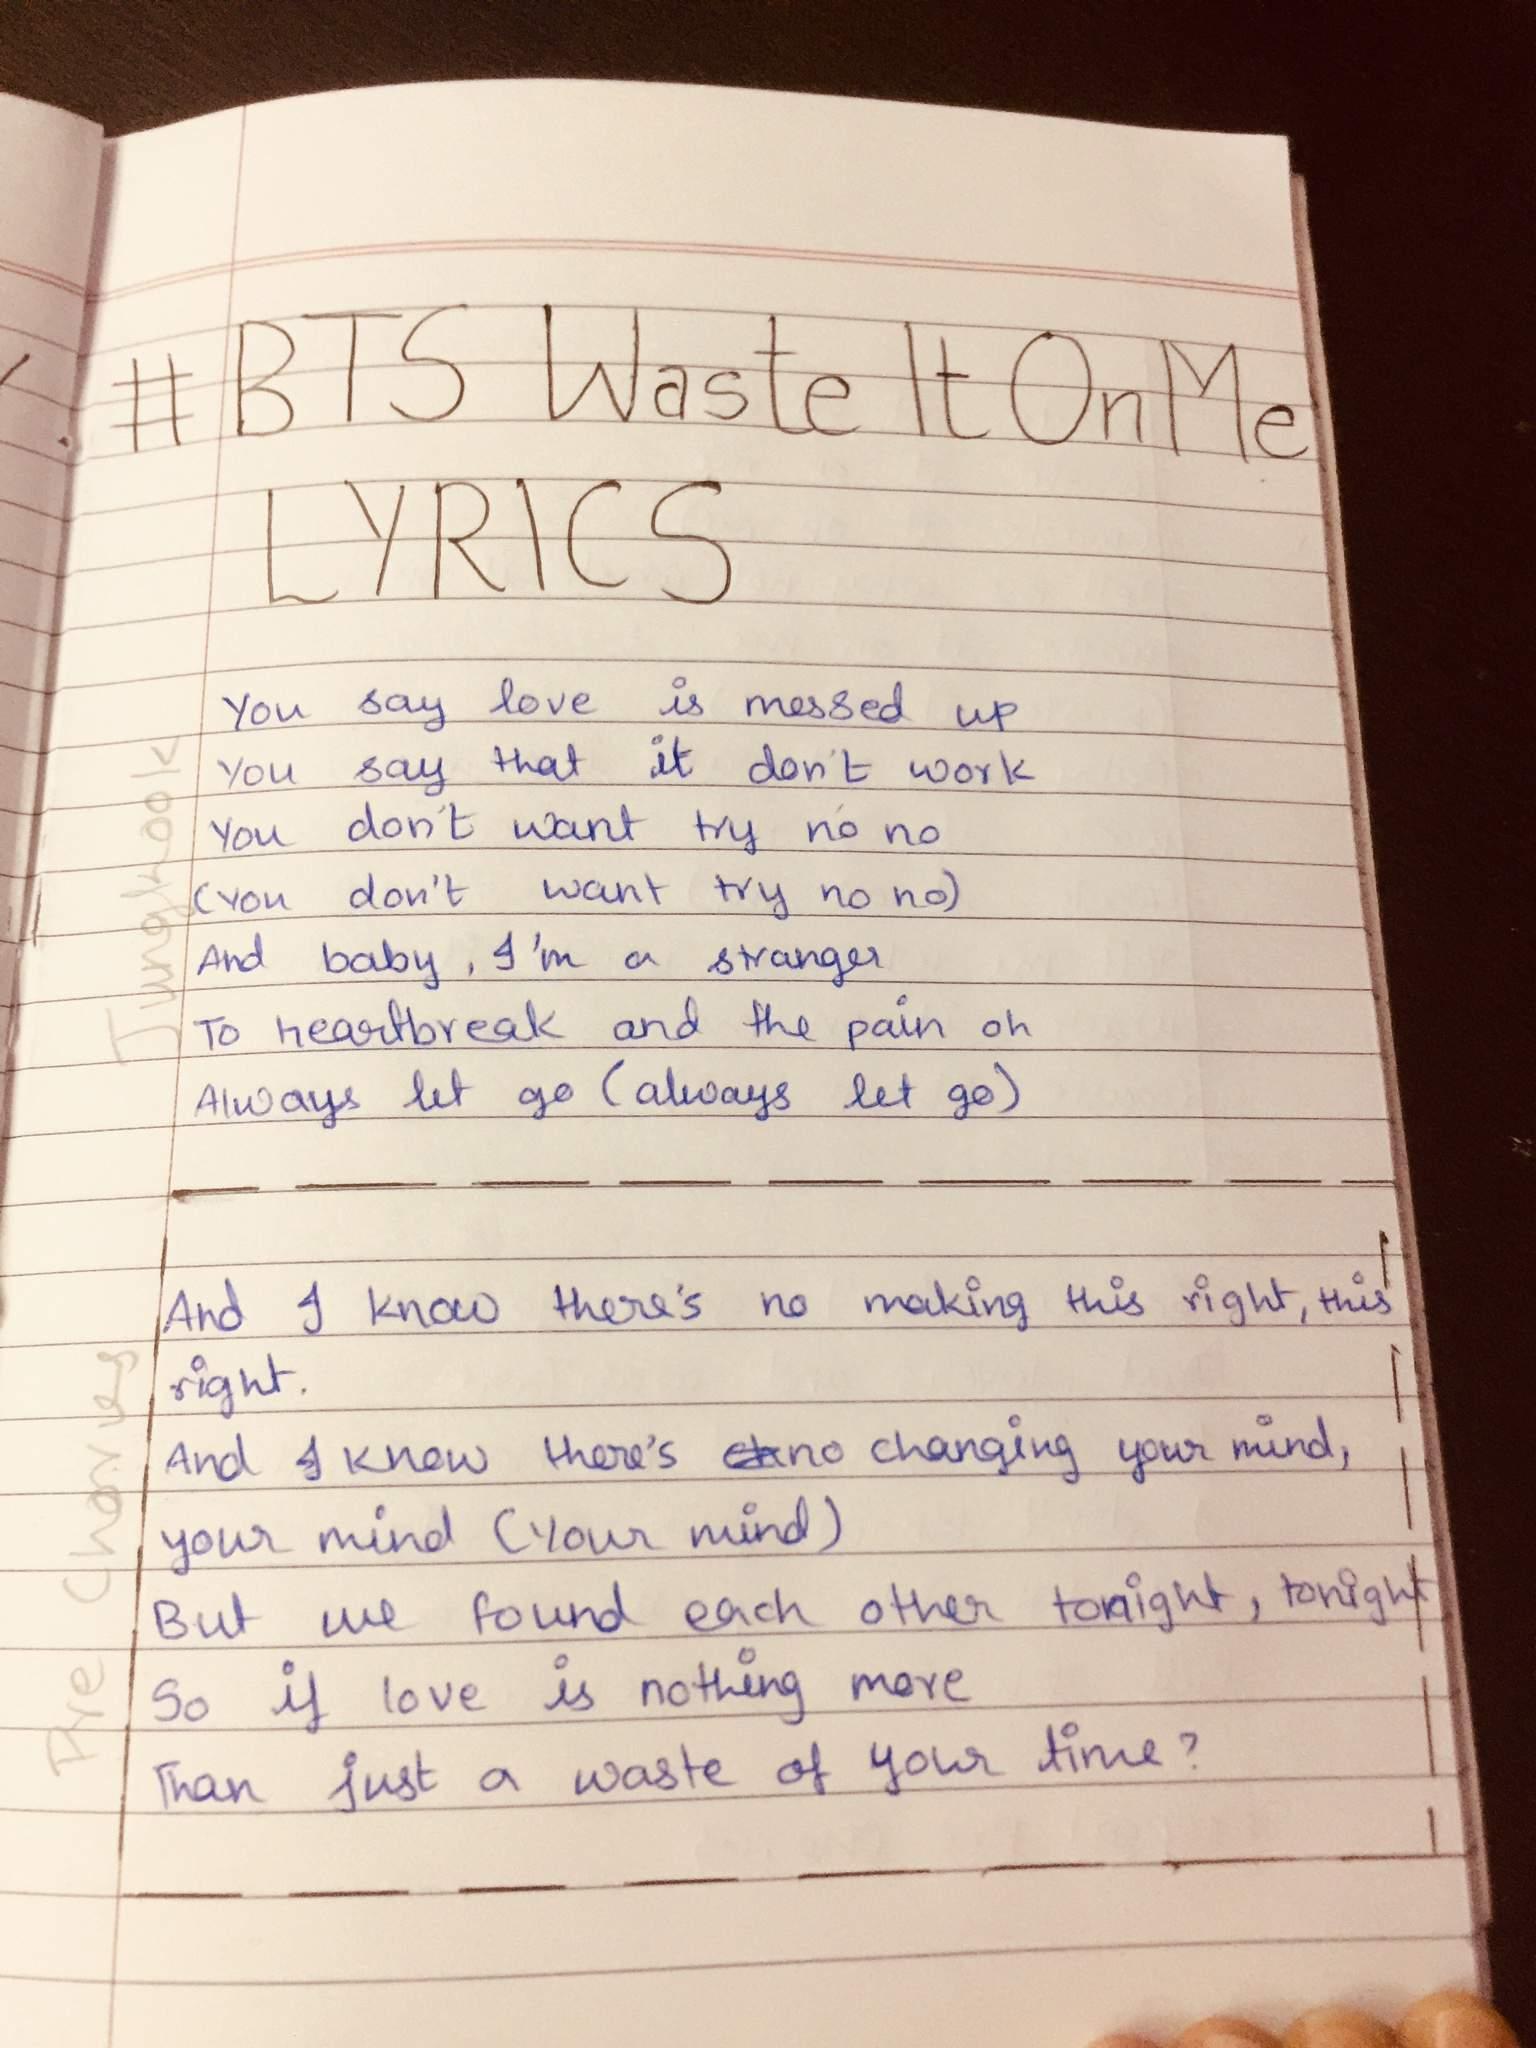 Bts Waste It On Me Lyrics Jungkook Fanbase Amino